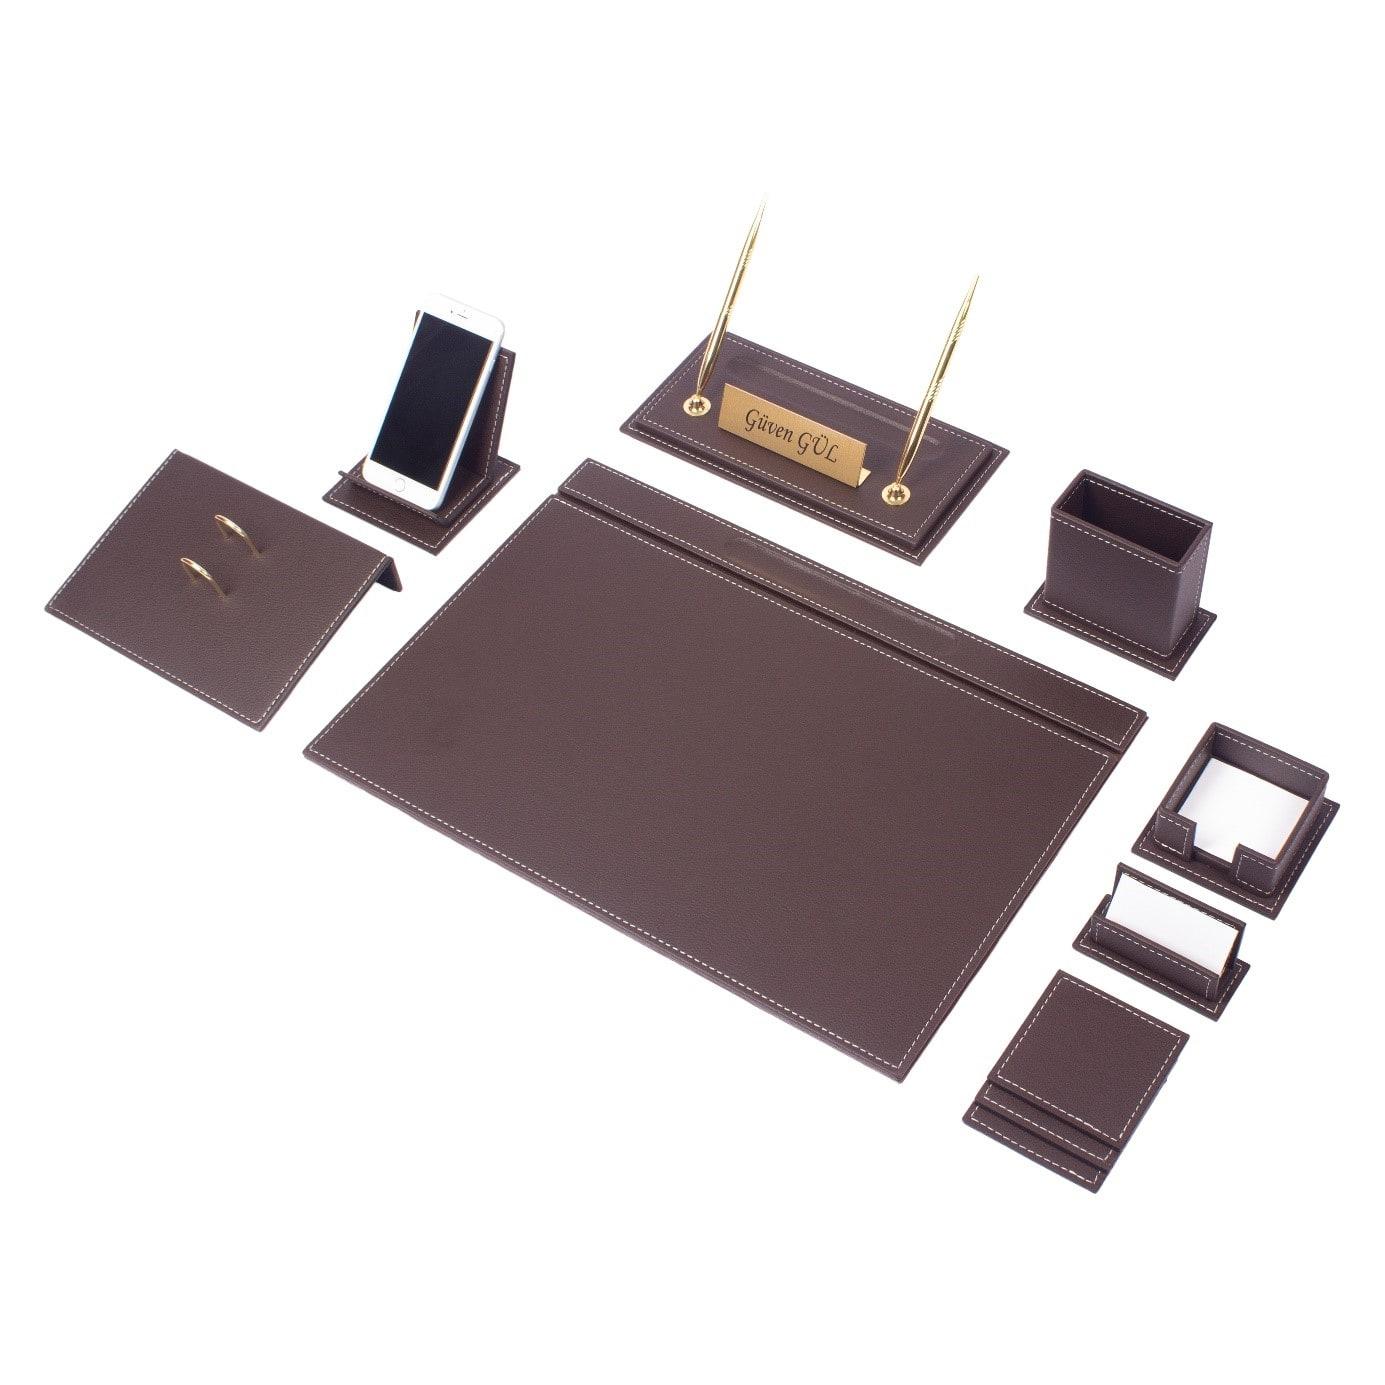 Vega Desk Set 12 Pieces